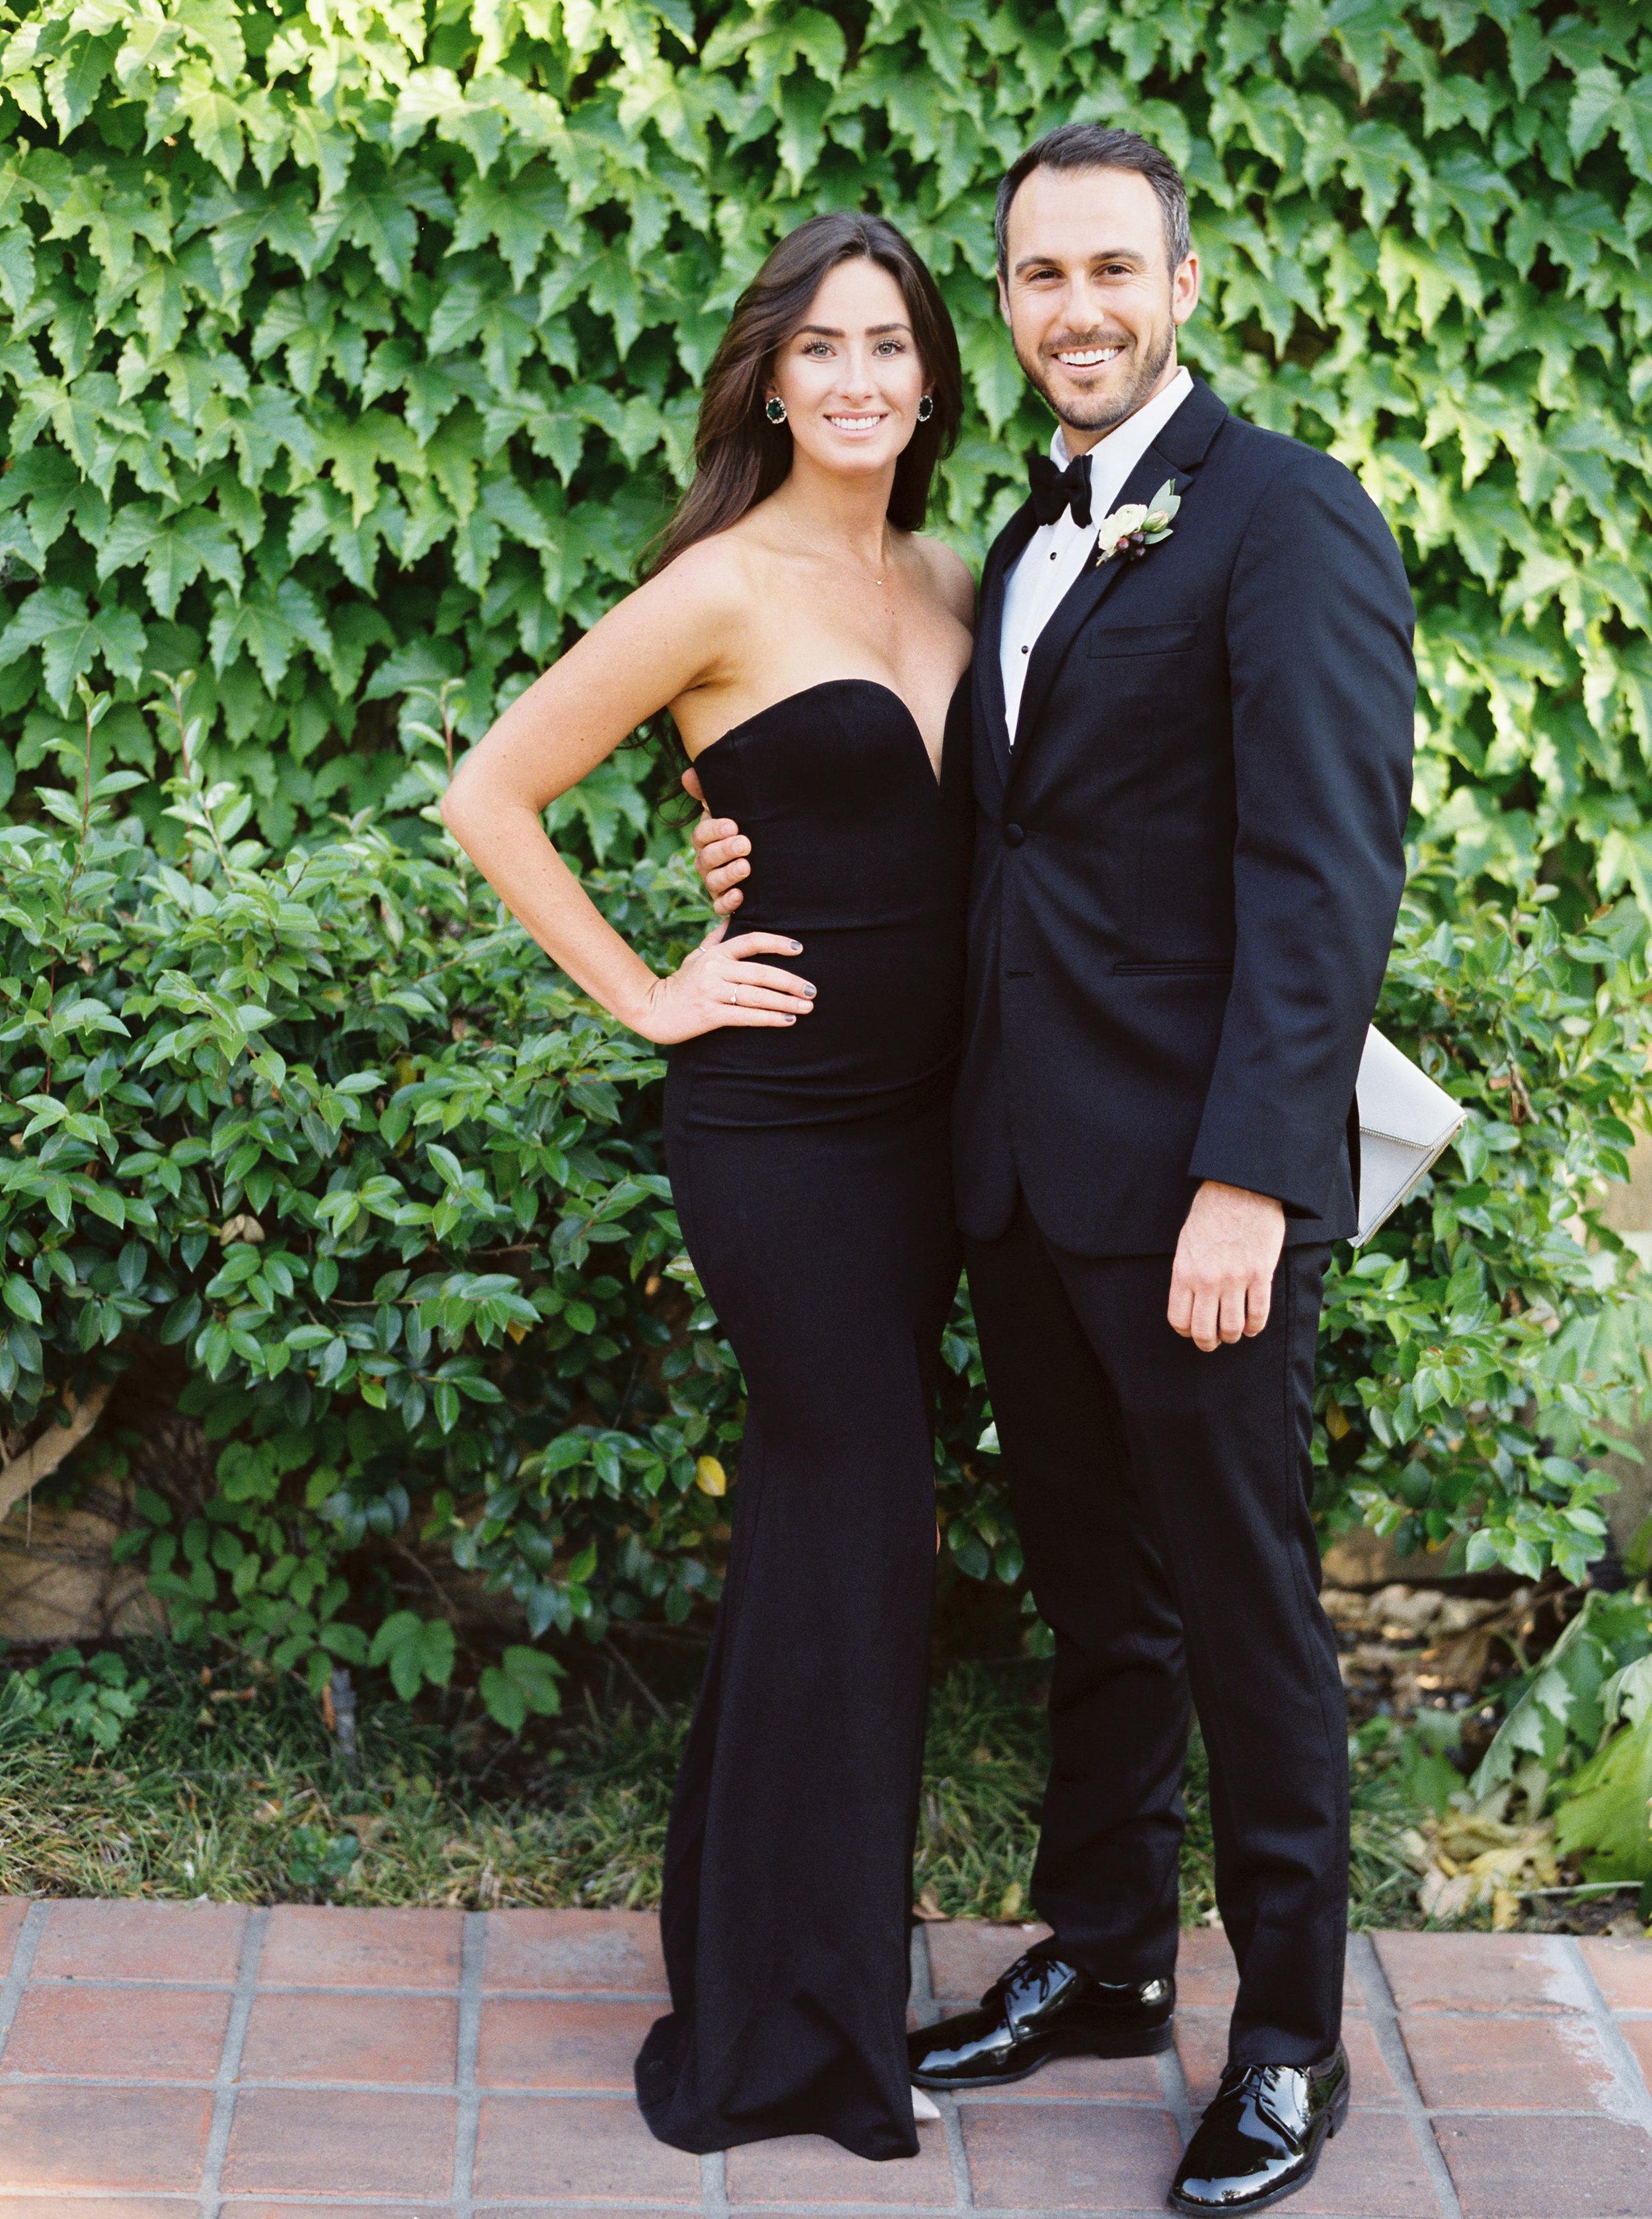 vintners-inn-wedding-in-santa-rosa-california-185.jpg